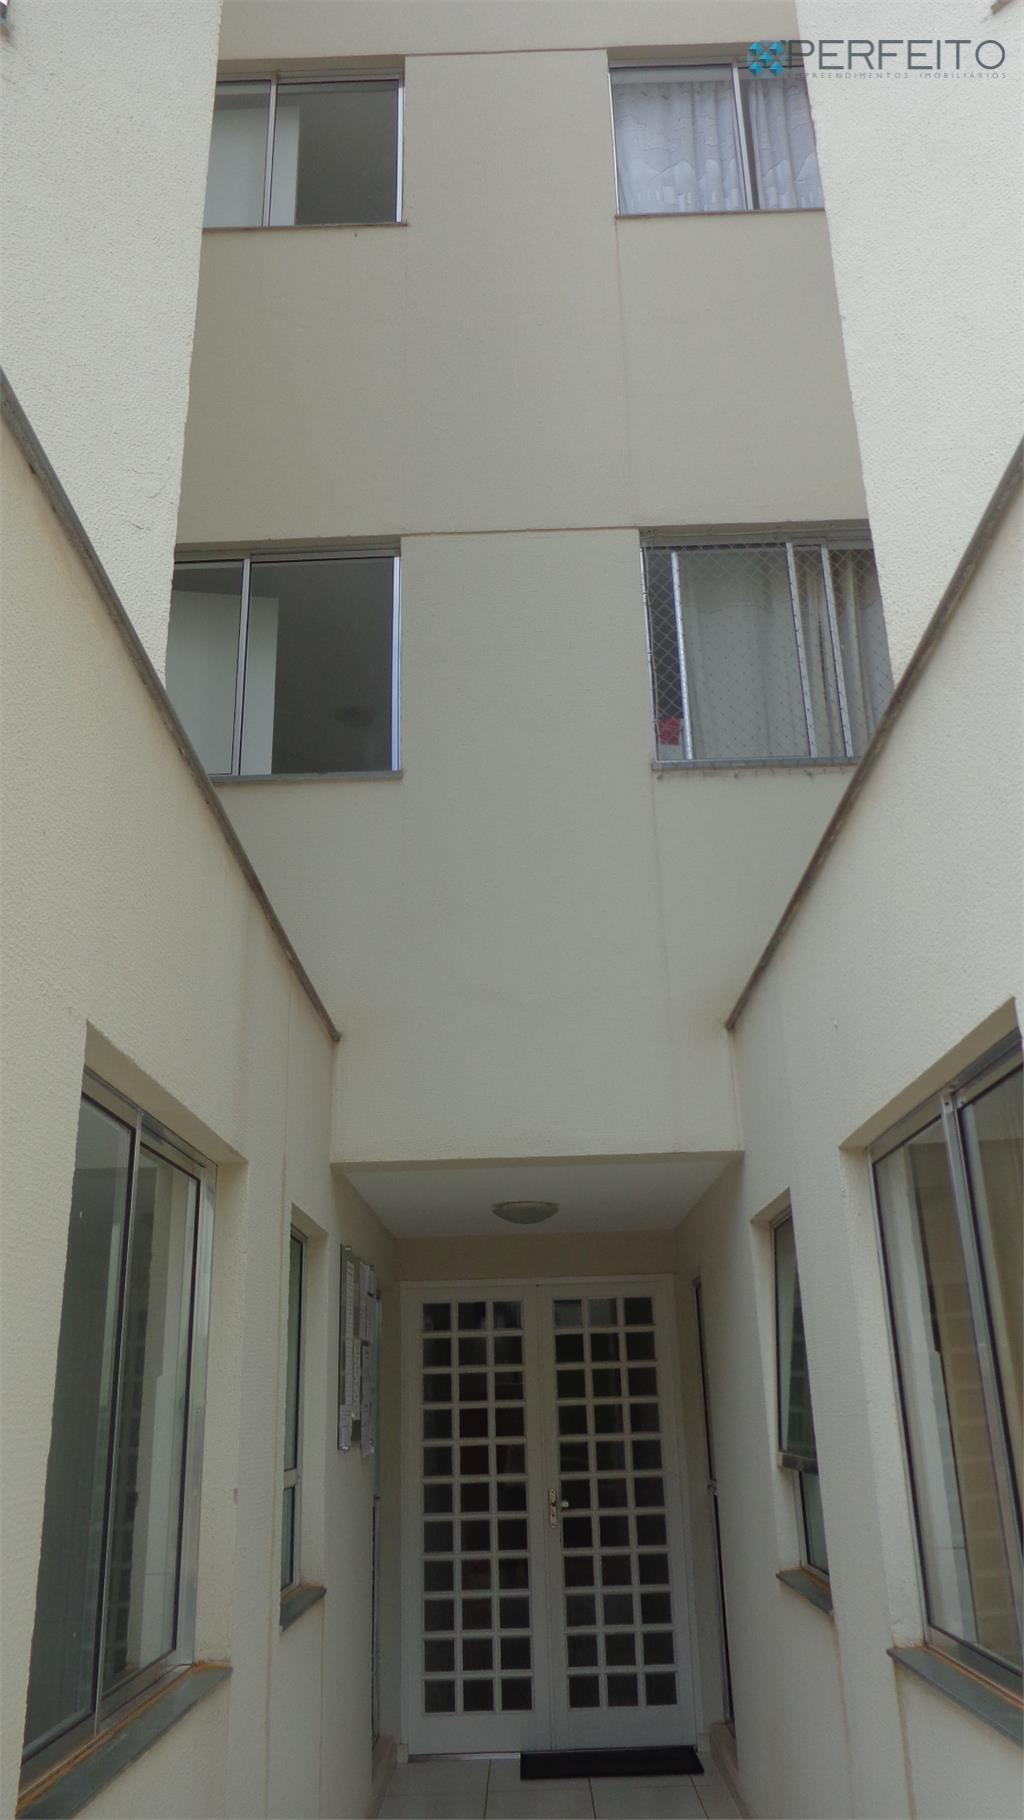 Apartamento residencial à venda, Vila Nelo, Ibiporã - AP0522.